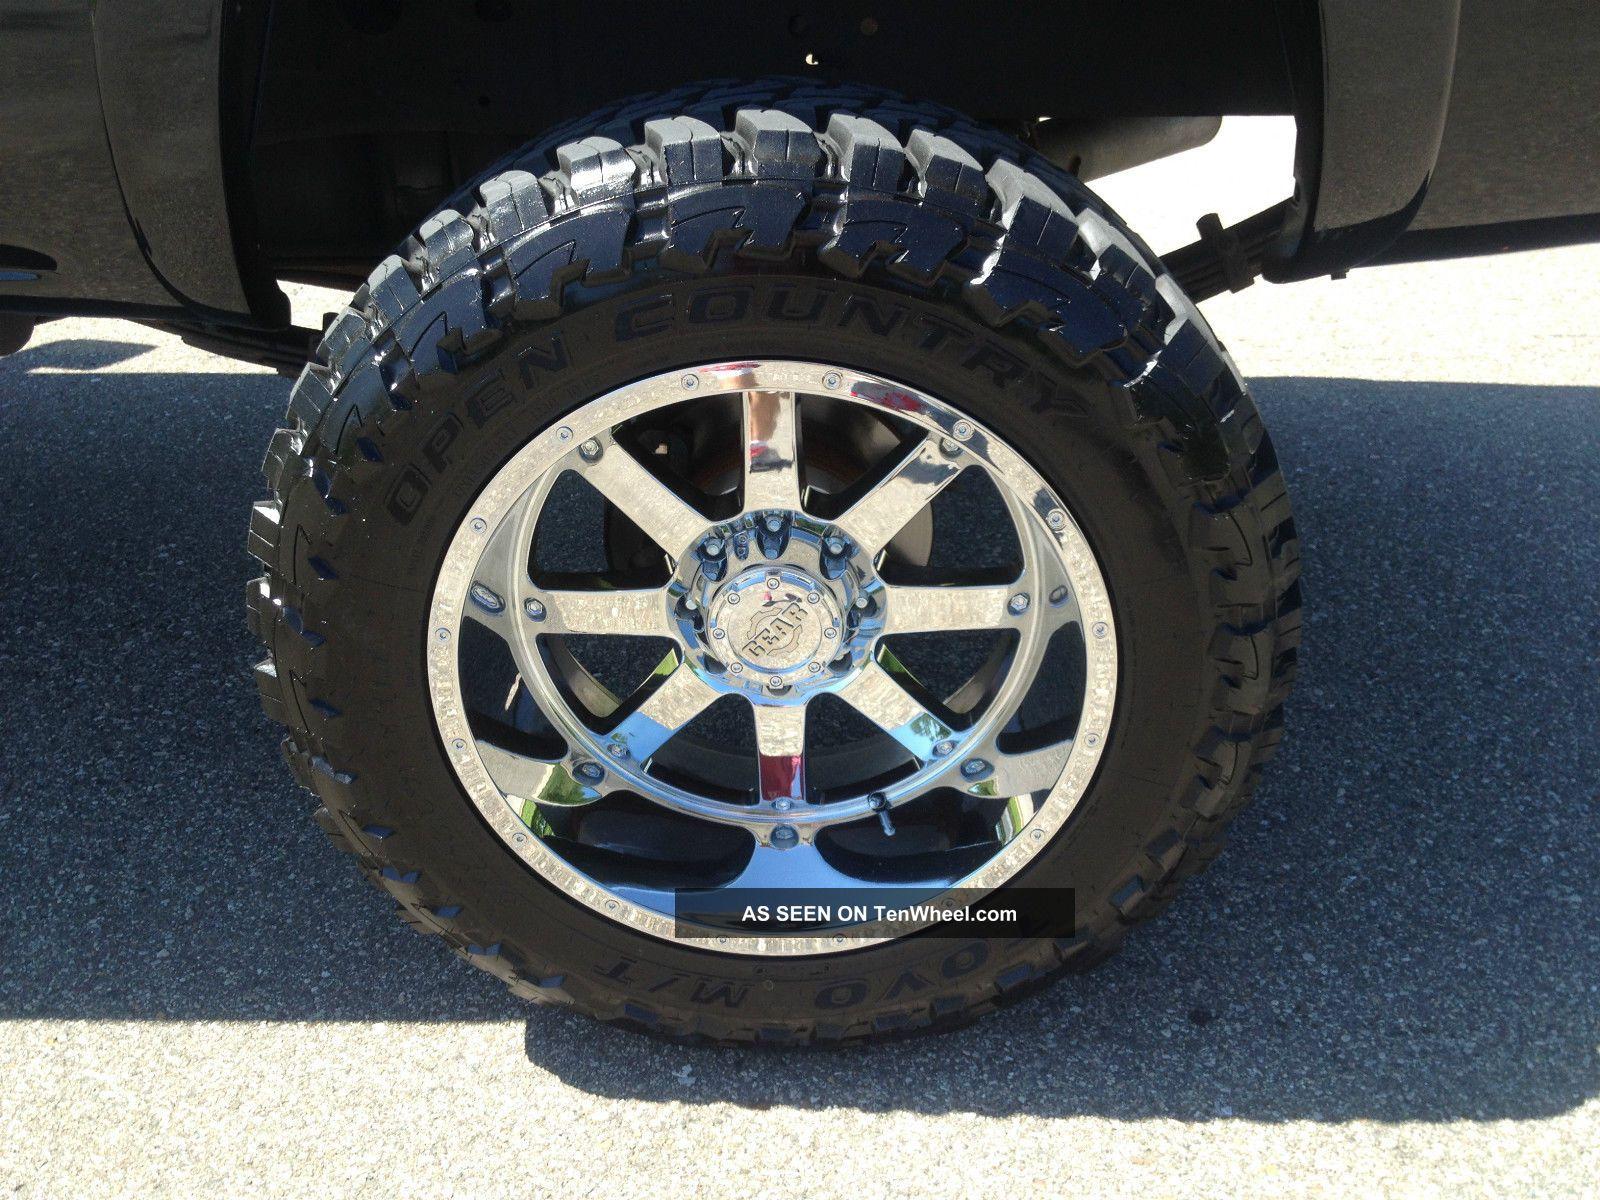 gmc sierra duramax wheels 2006 lbz lift 2500hd diesel speed 56k 2500 cars 2040 trucks